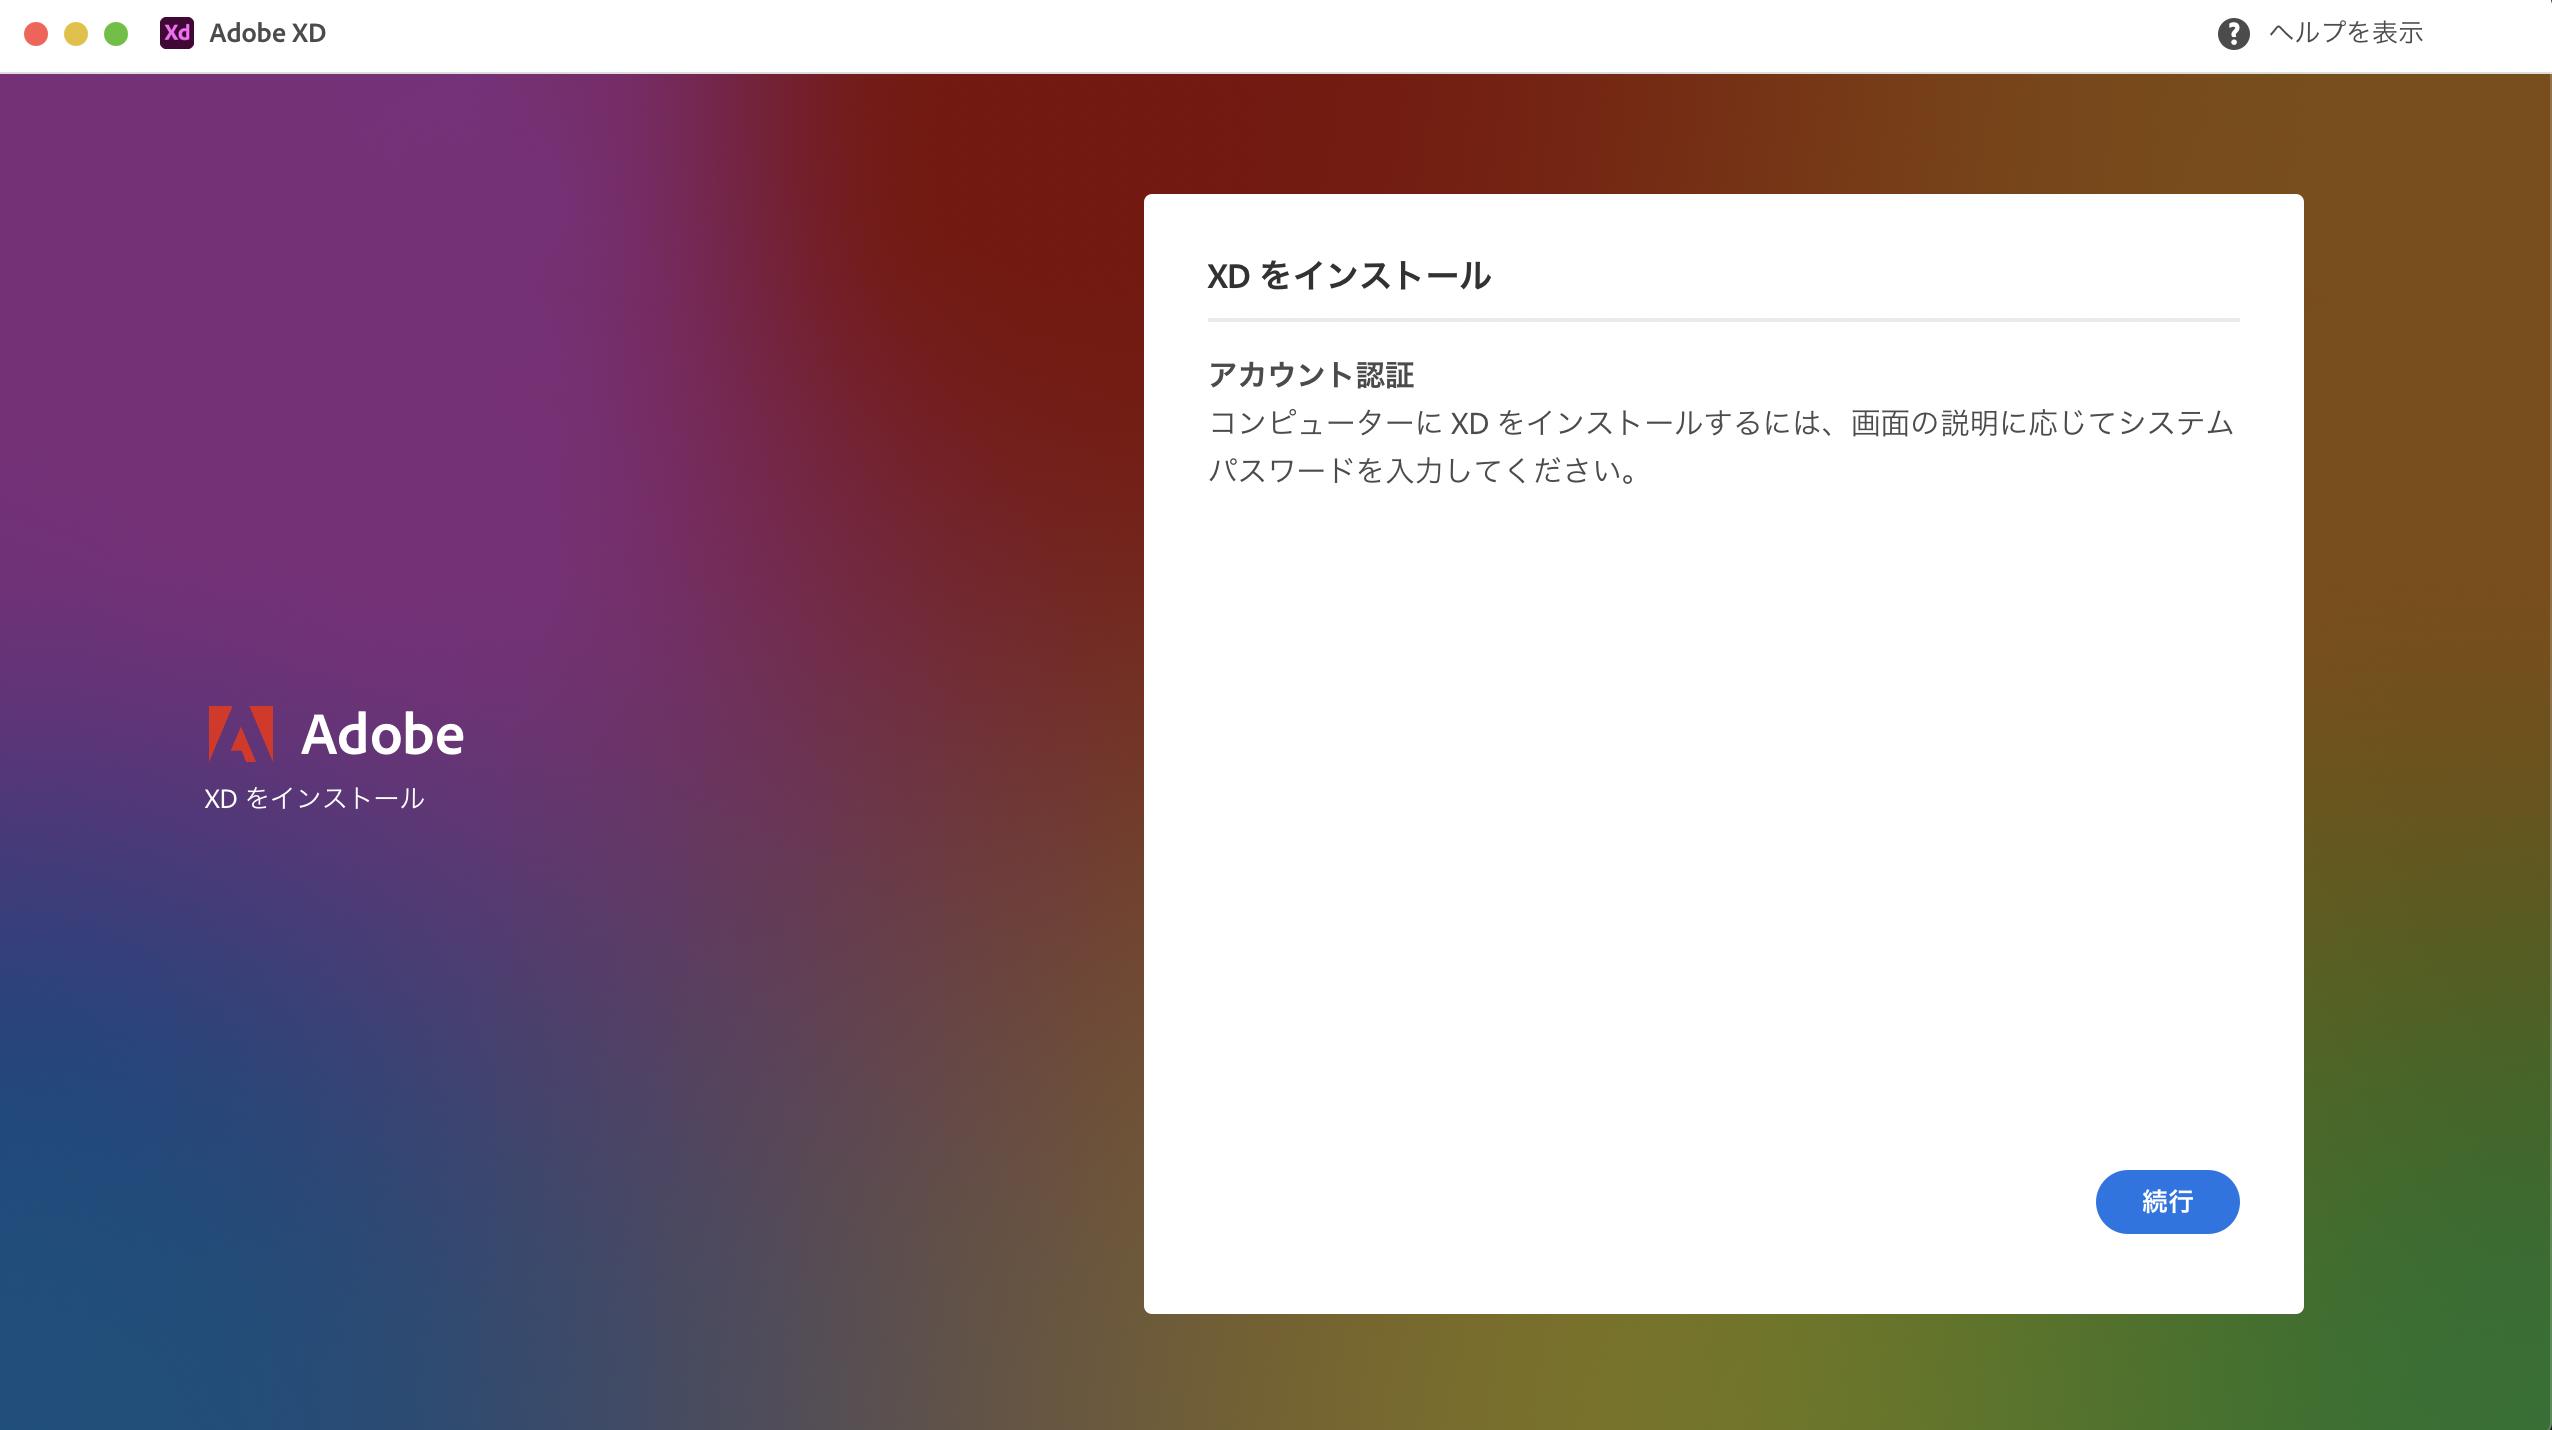 Adobe XD Install